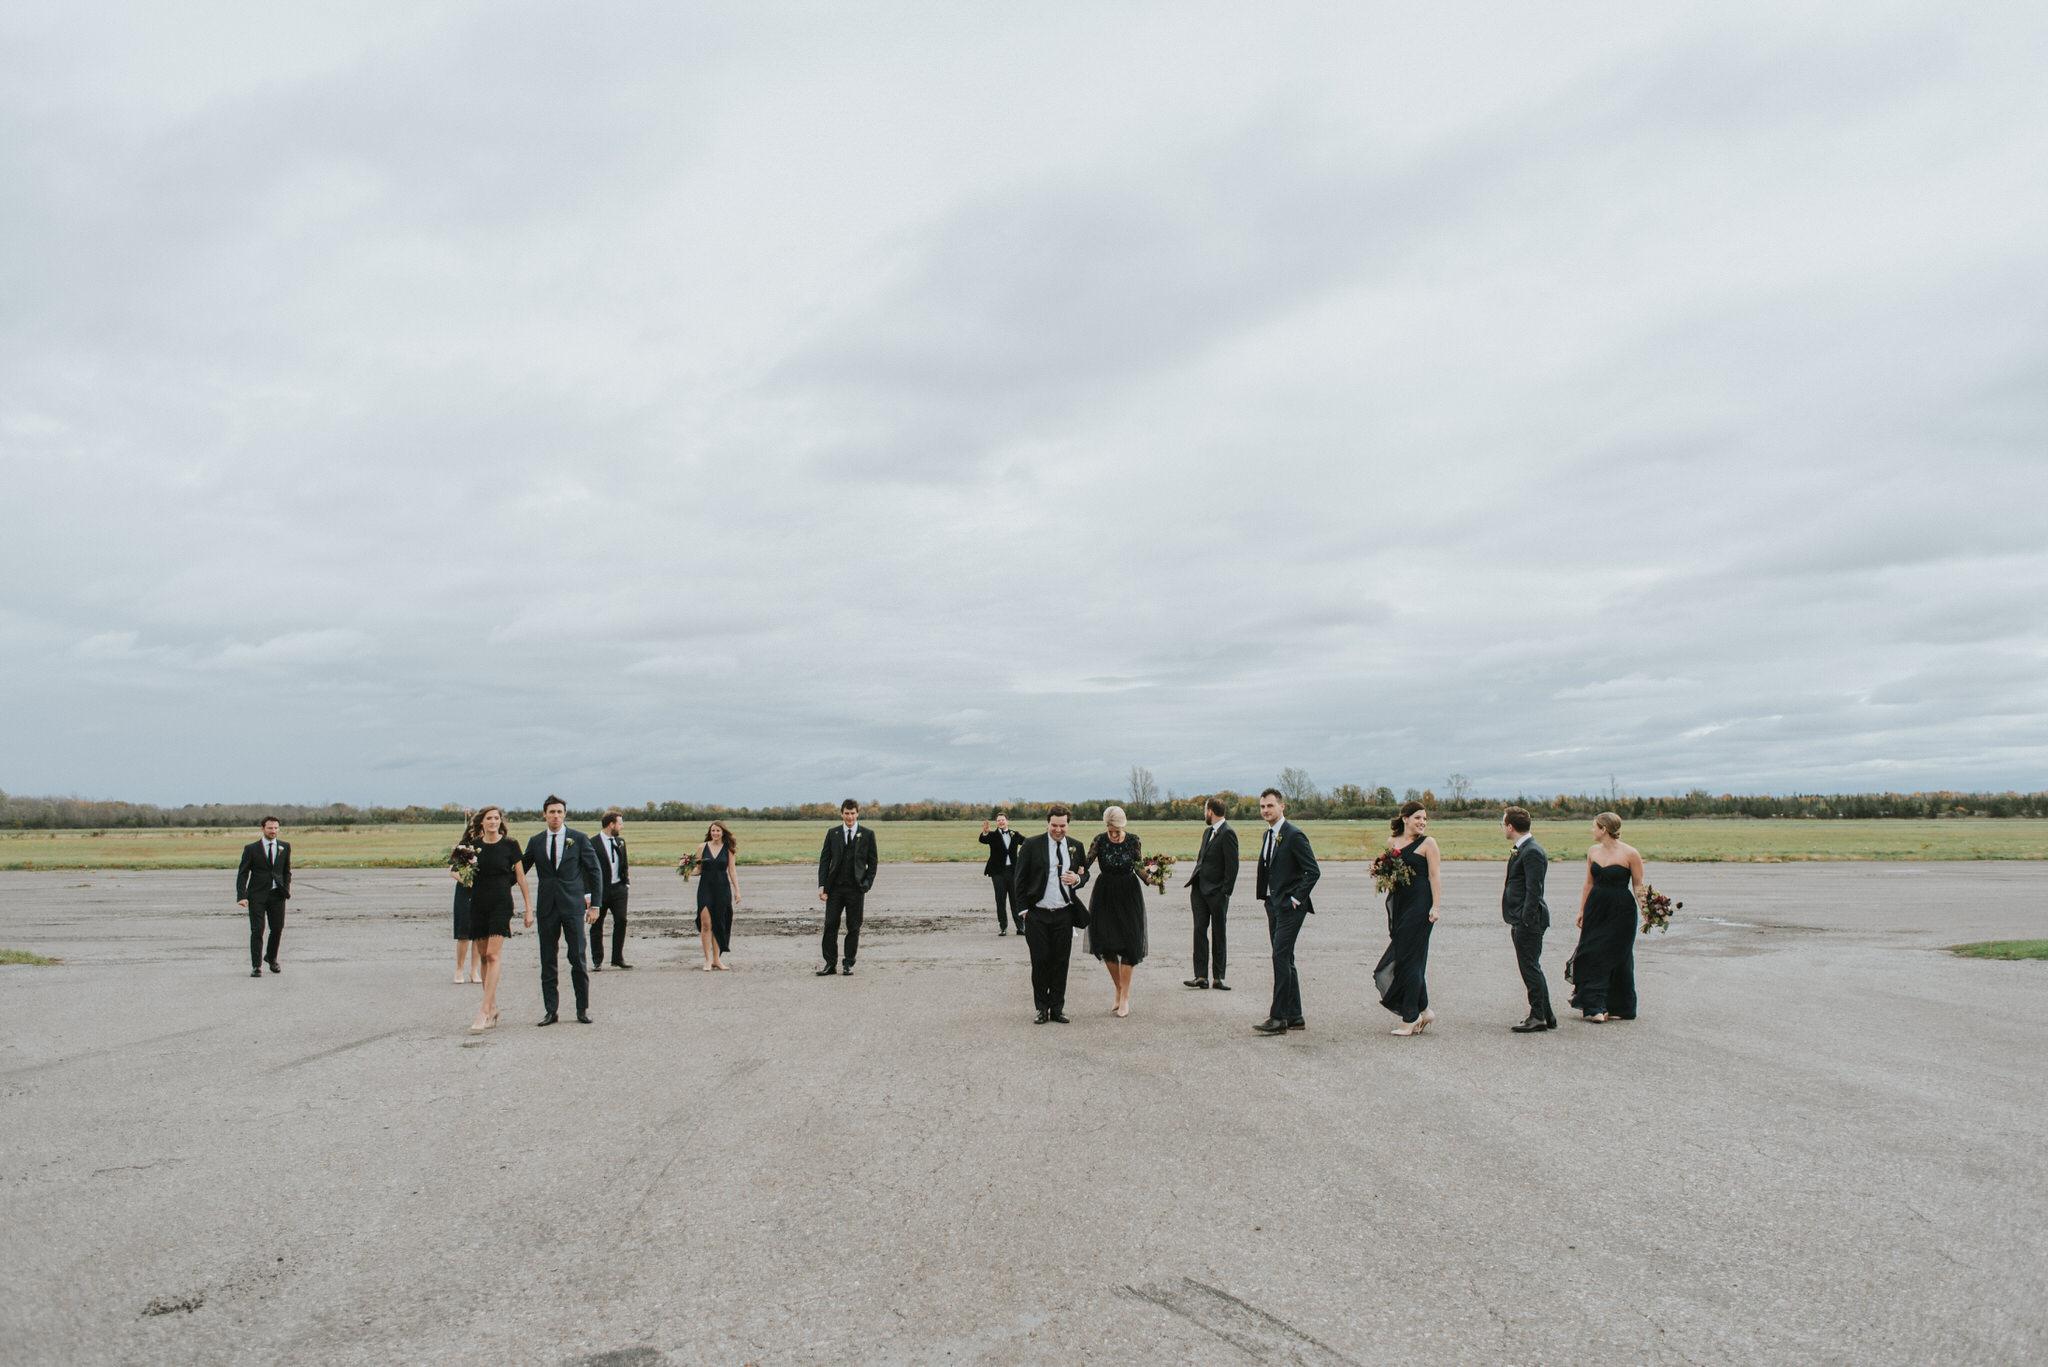 scarletoneillphotography_weddingphotography_prince edward county weddings055.JPG